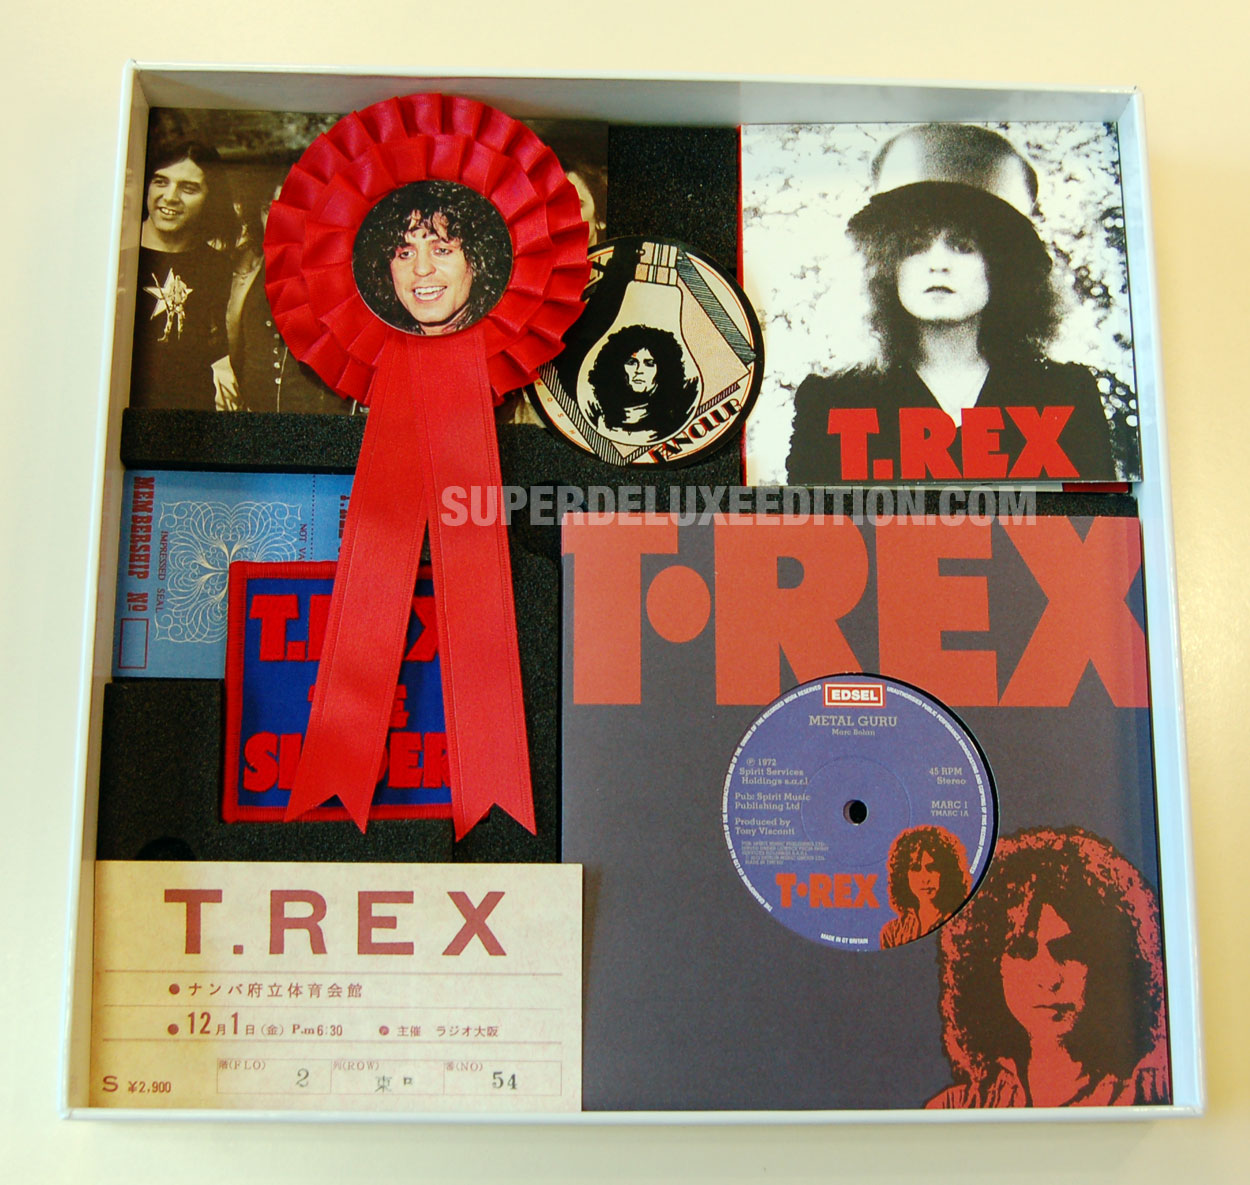 T.Rex / The Slider Super Deluxe Edition box set